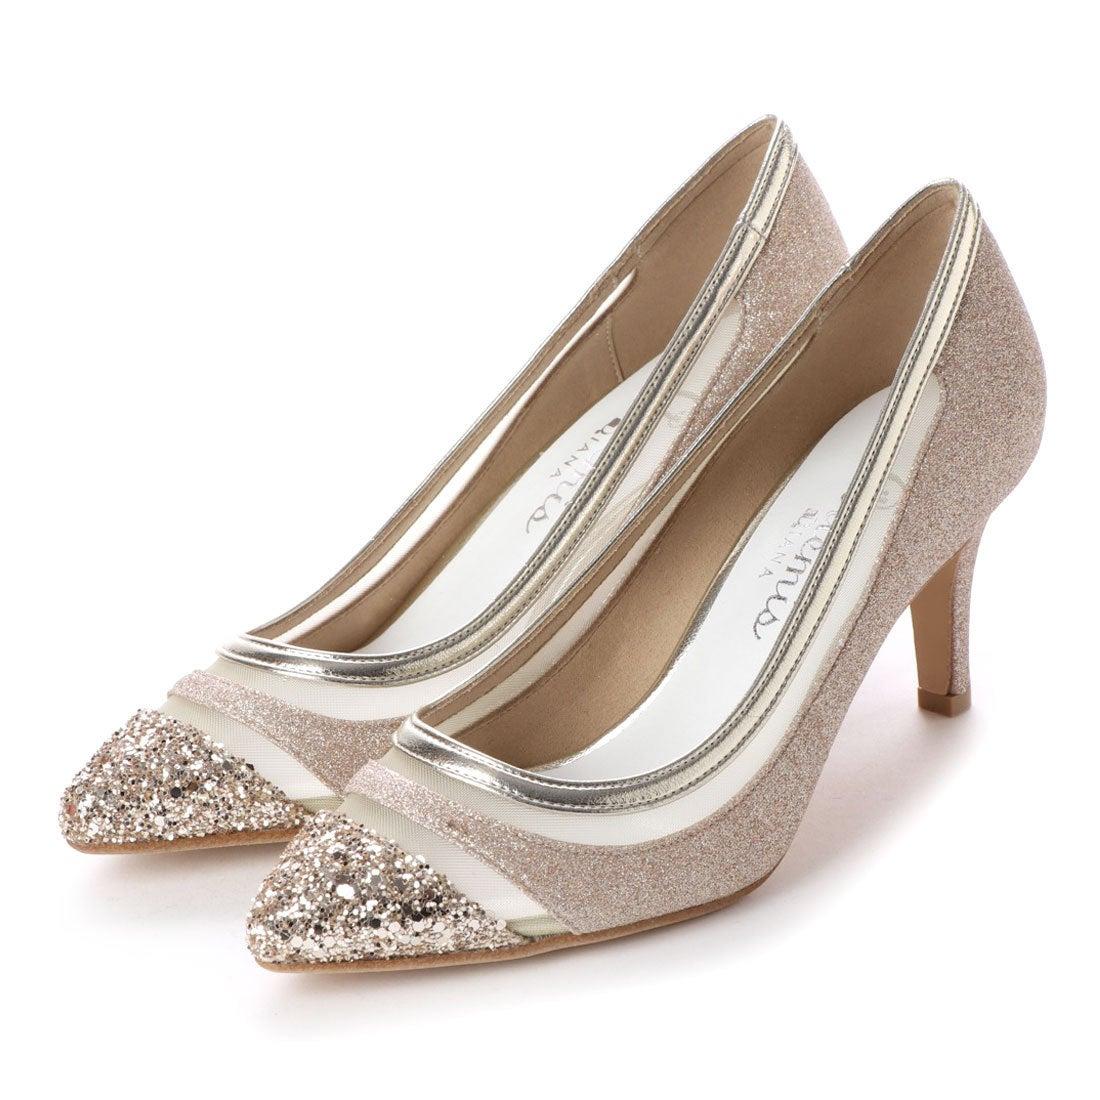 f58e489c45dc0 アルテミス バイ ダイアナ artemis by DIANA ラメグリッターチュールパンプス (ゴールドラメ) -靴&ファッション通販  ロコンド〜自宅で試着、気軽に返品